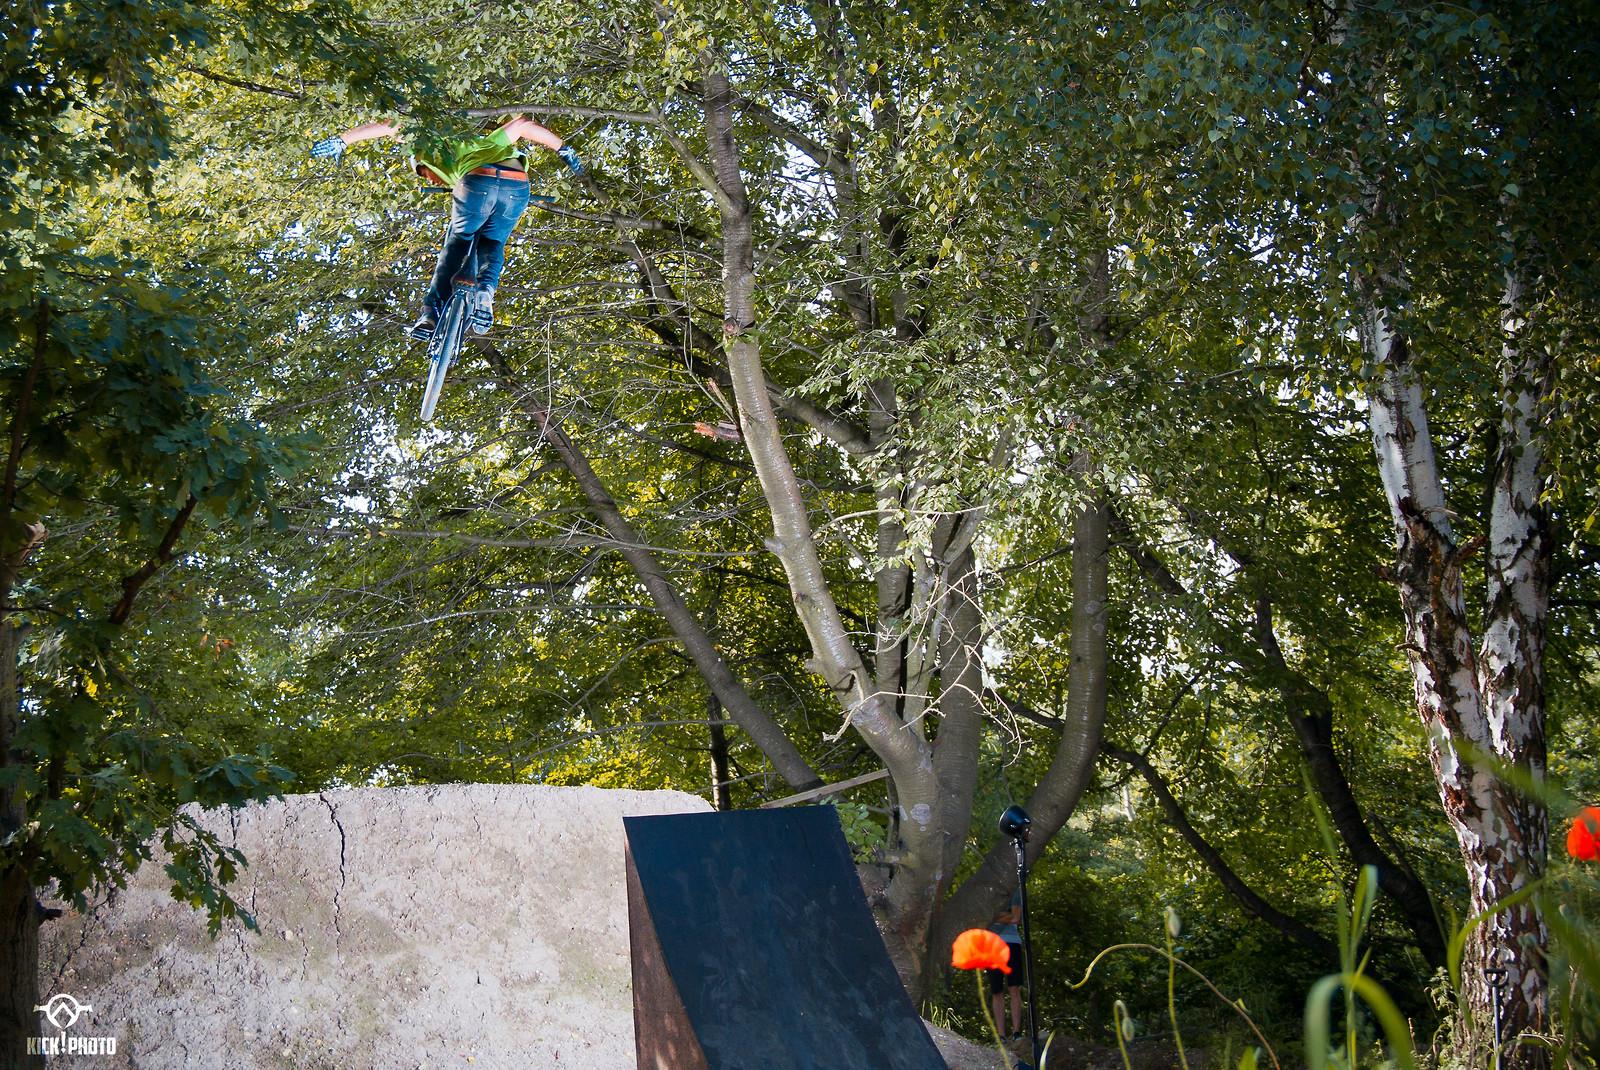 Oldie - Kick!Photo - Mountain Biking Pictures - Vital MTB